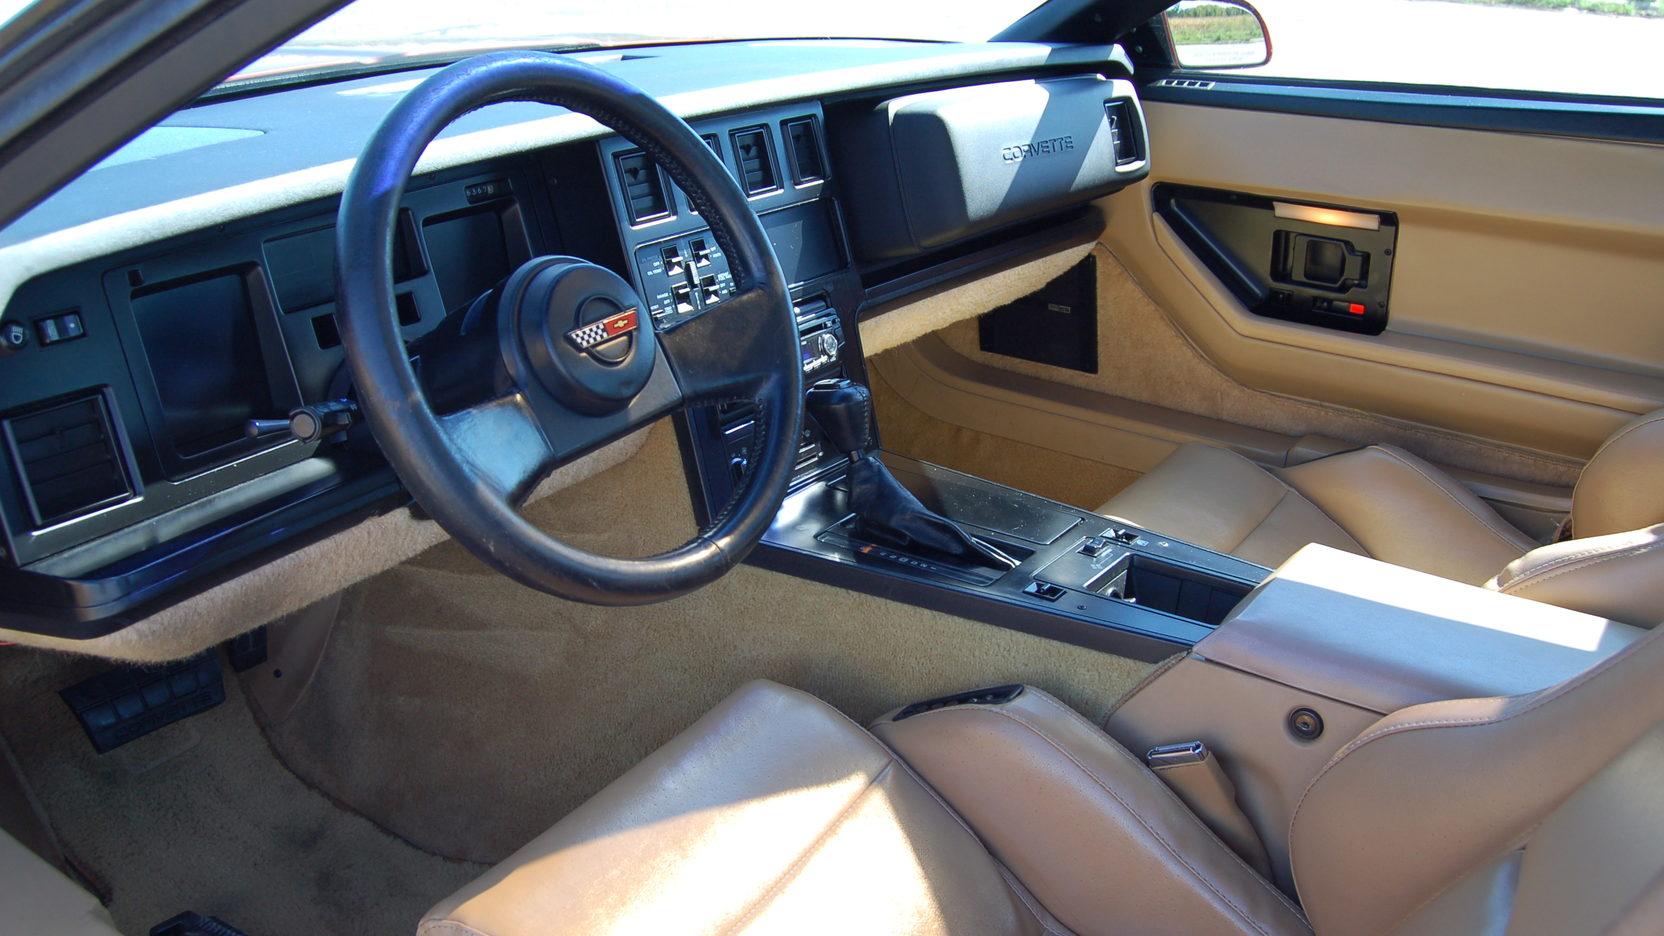 1987 Chevrolet Corvette interior dash